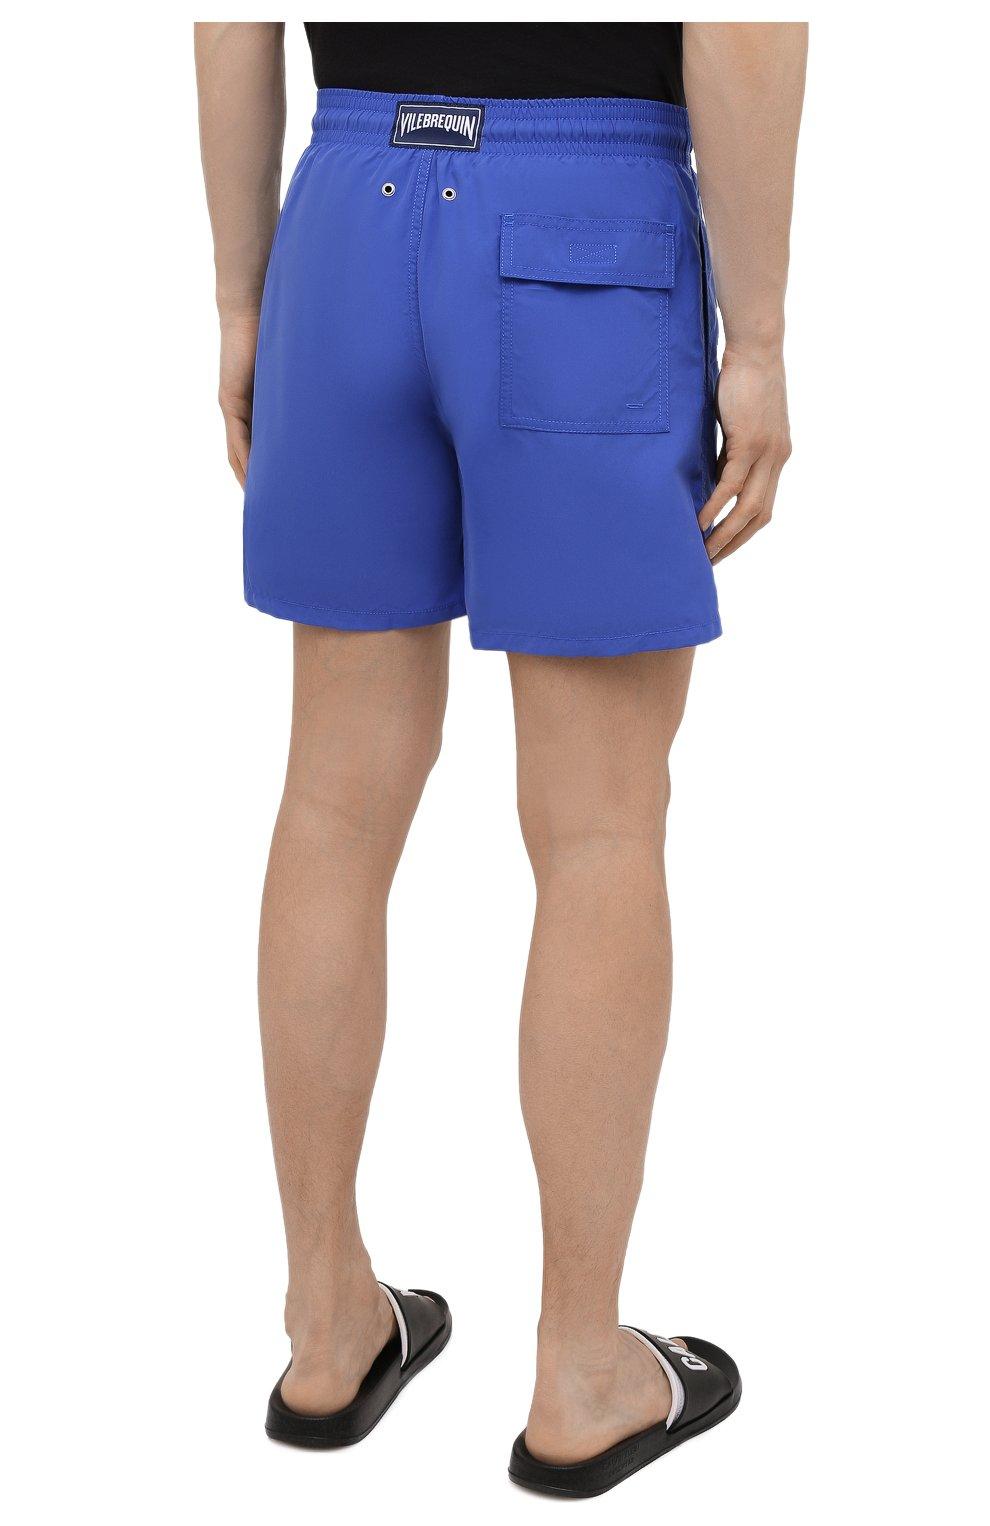 Мужские плавки-шорты VILEBREQUIN фиолетового цвета, арт. MOOC1A00/314 | Фото 4 (Принт: Без принта; Материал внешний: Синтетический материал)